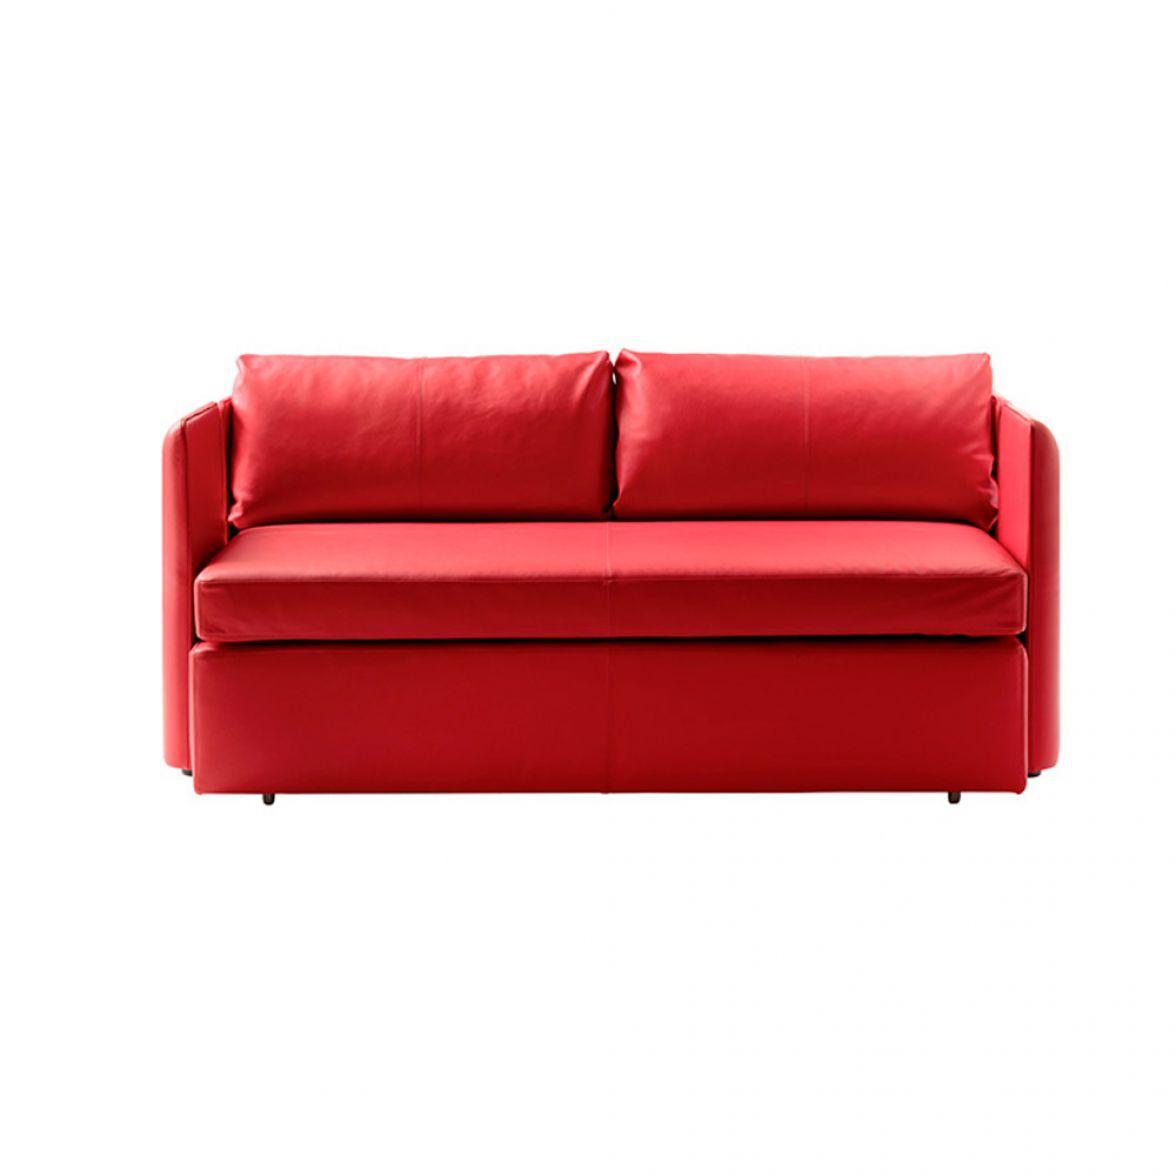 Naidei sofa фото цена